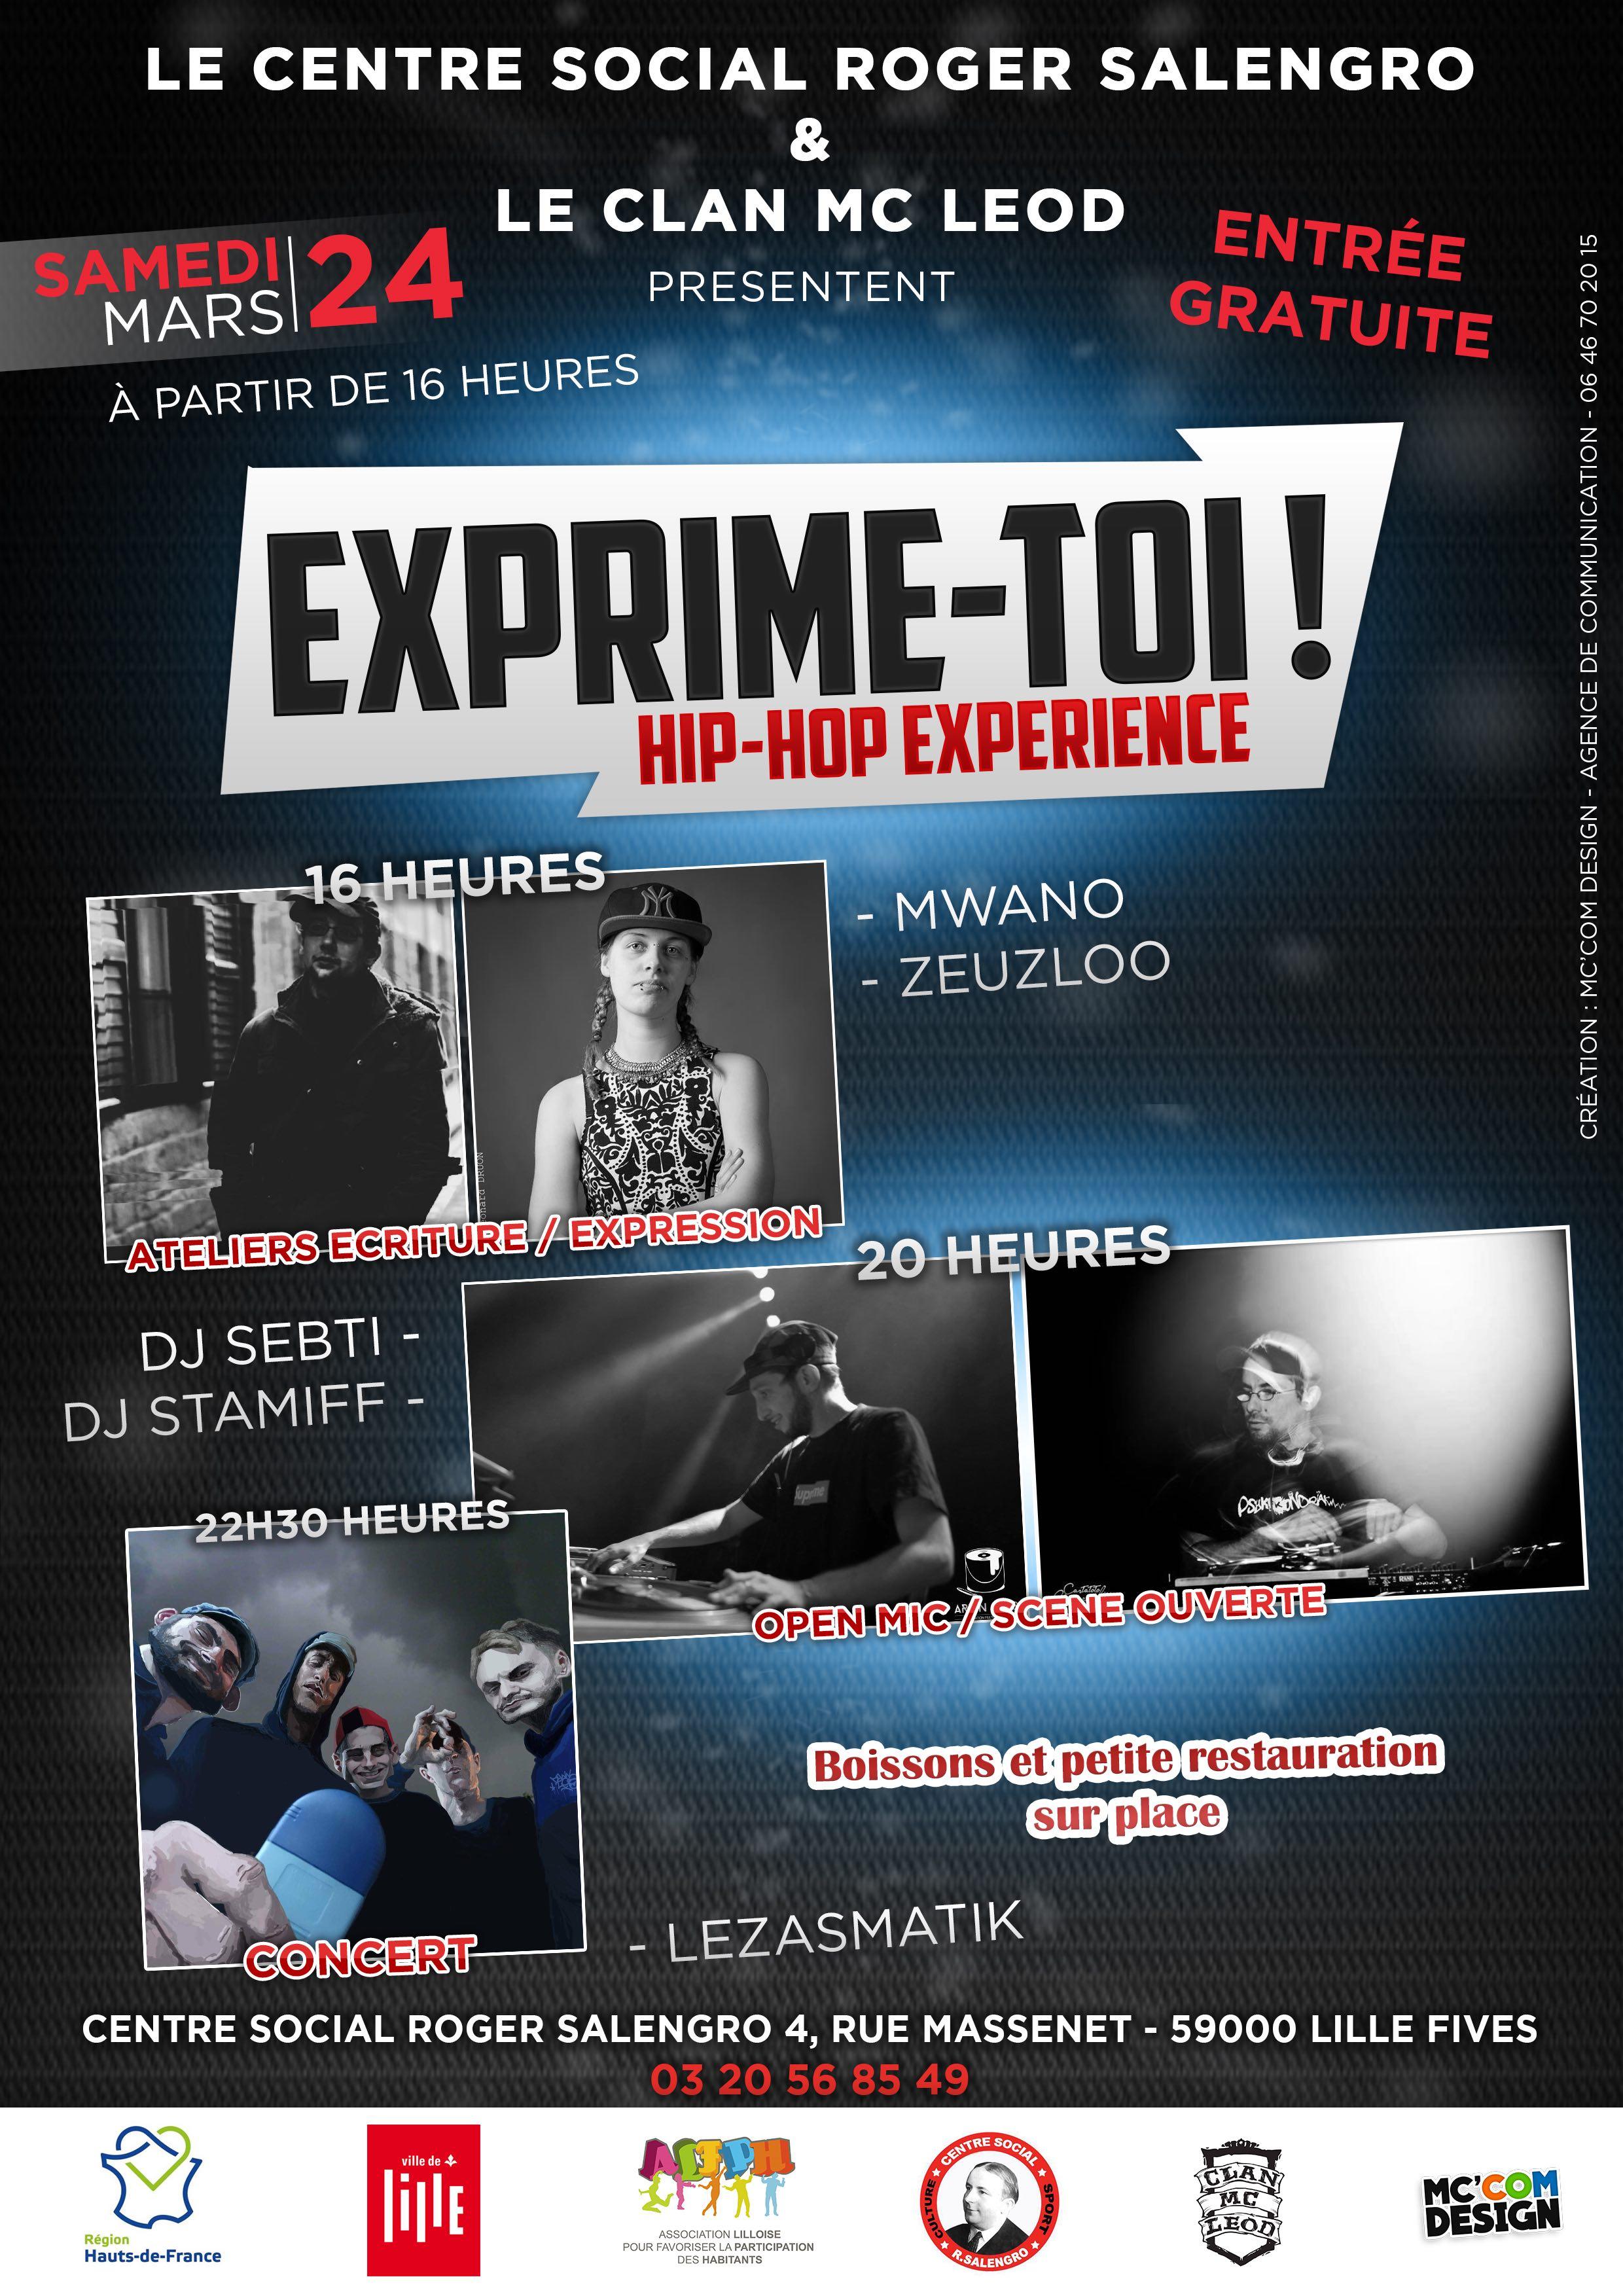 hip hop expérience clan mc leod centre social salengro